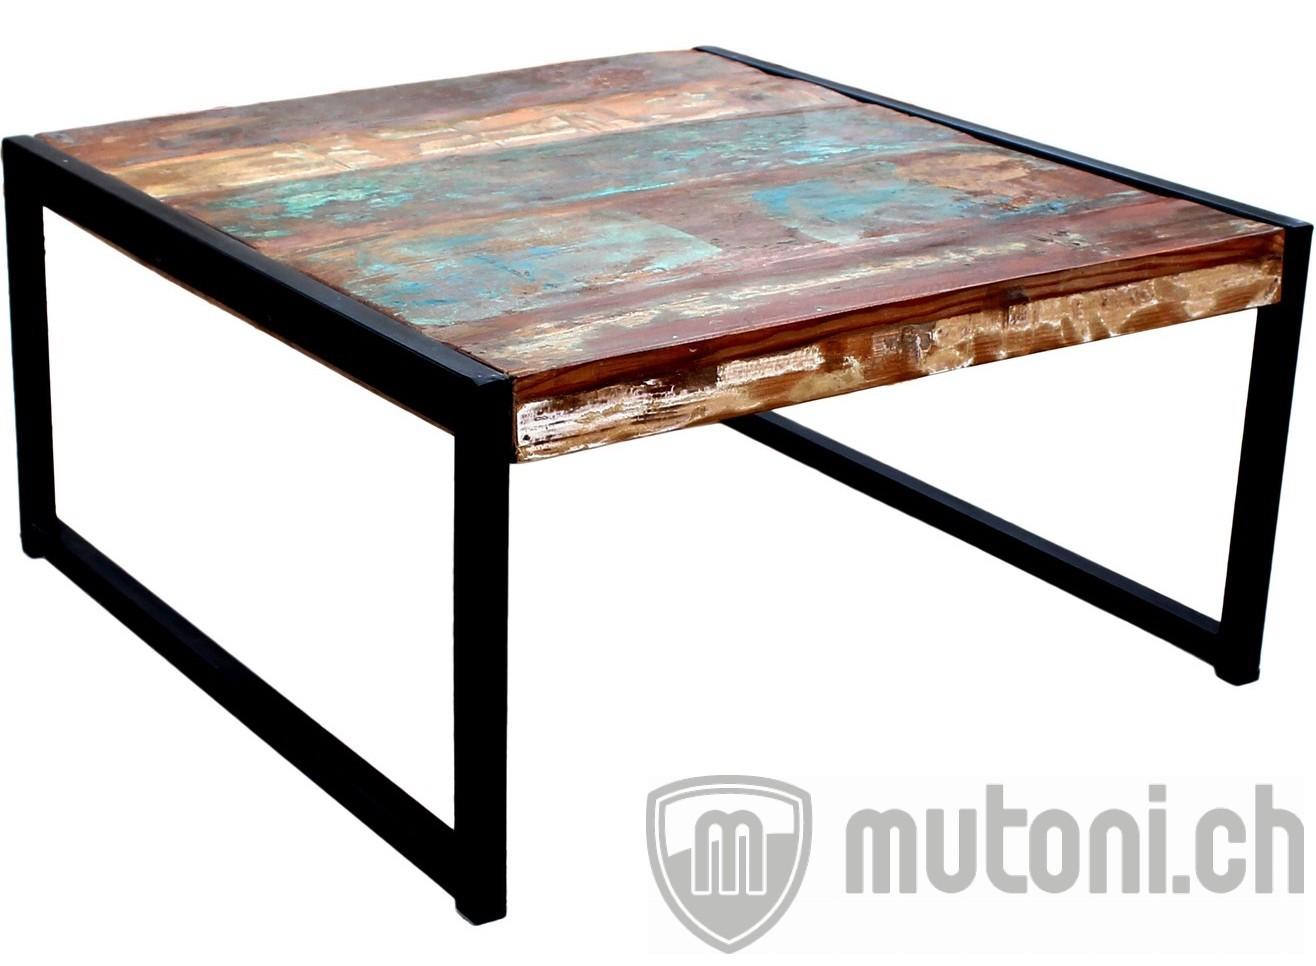 table basse vintage colored agra color noir antique 70x70 mutoni living mutoni m bel. Black Bedroom Furniture Sets. Home Design Ideas